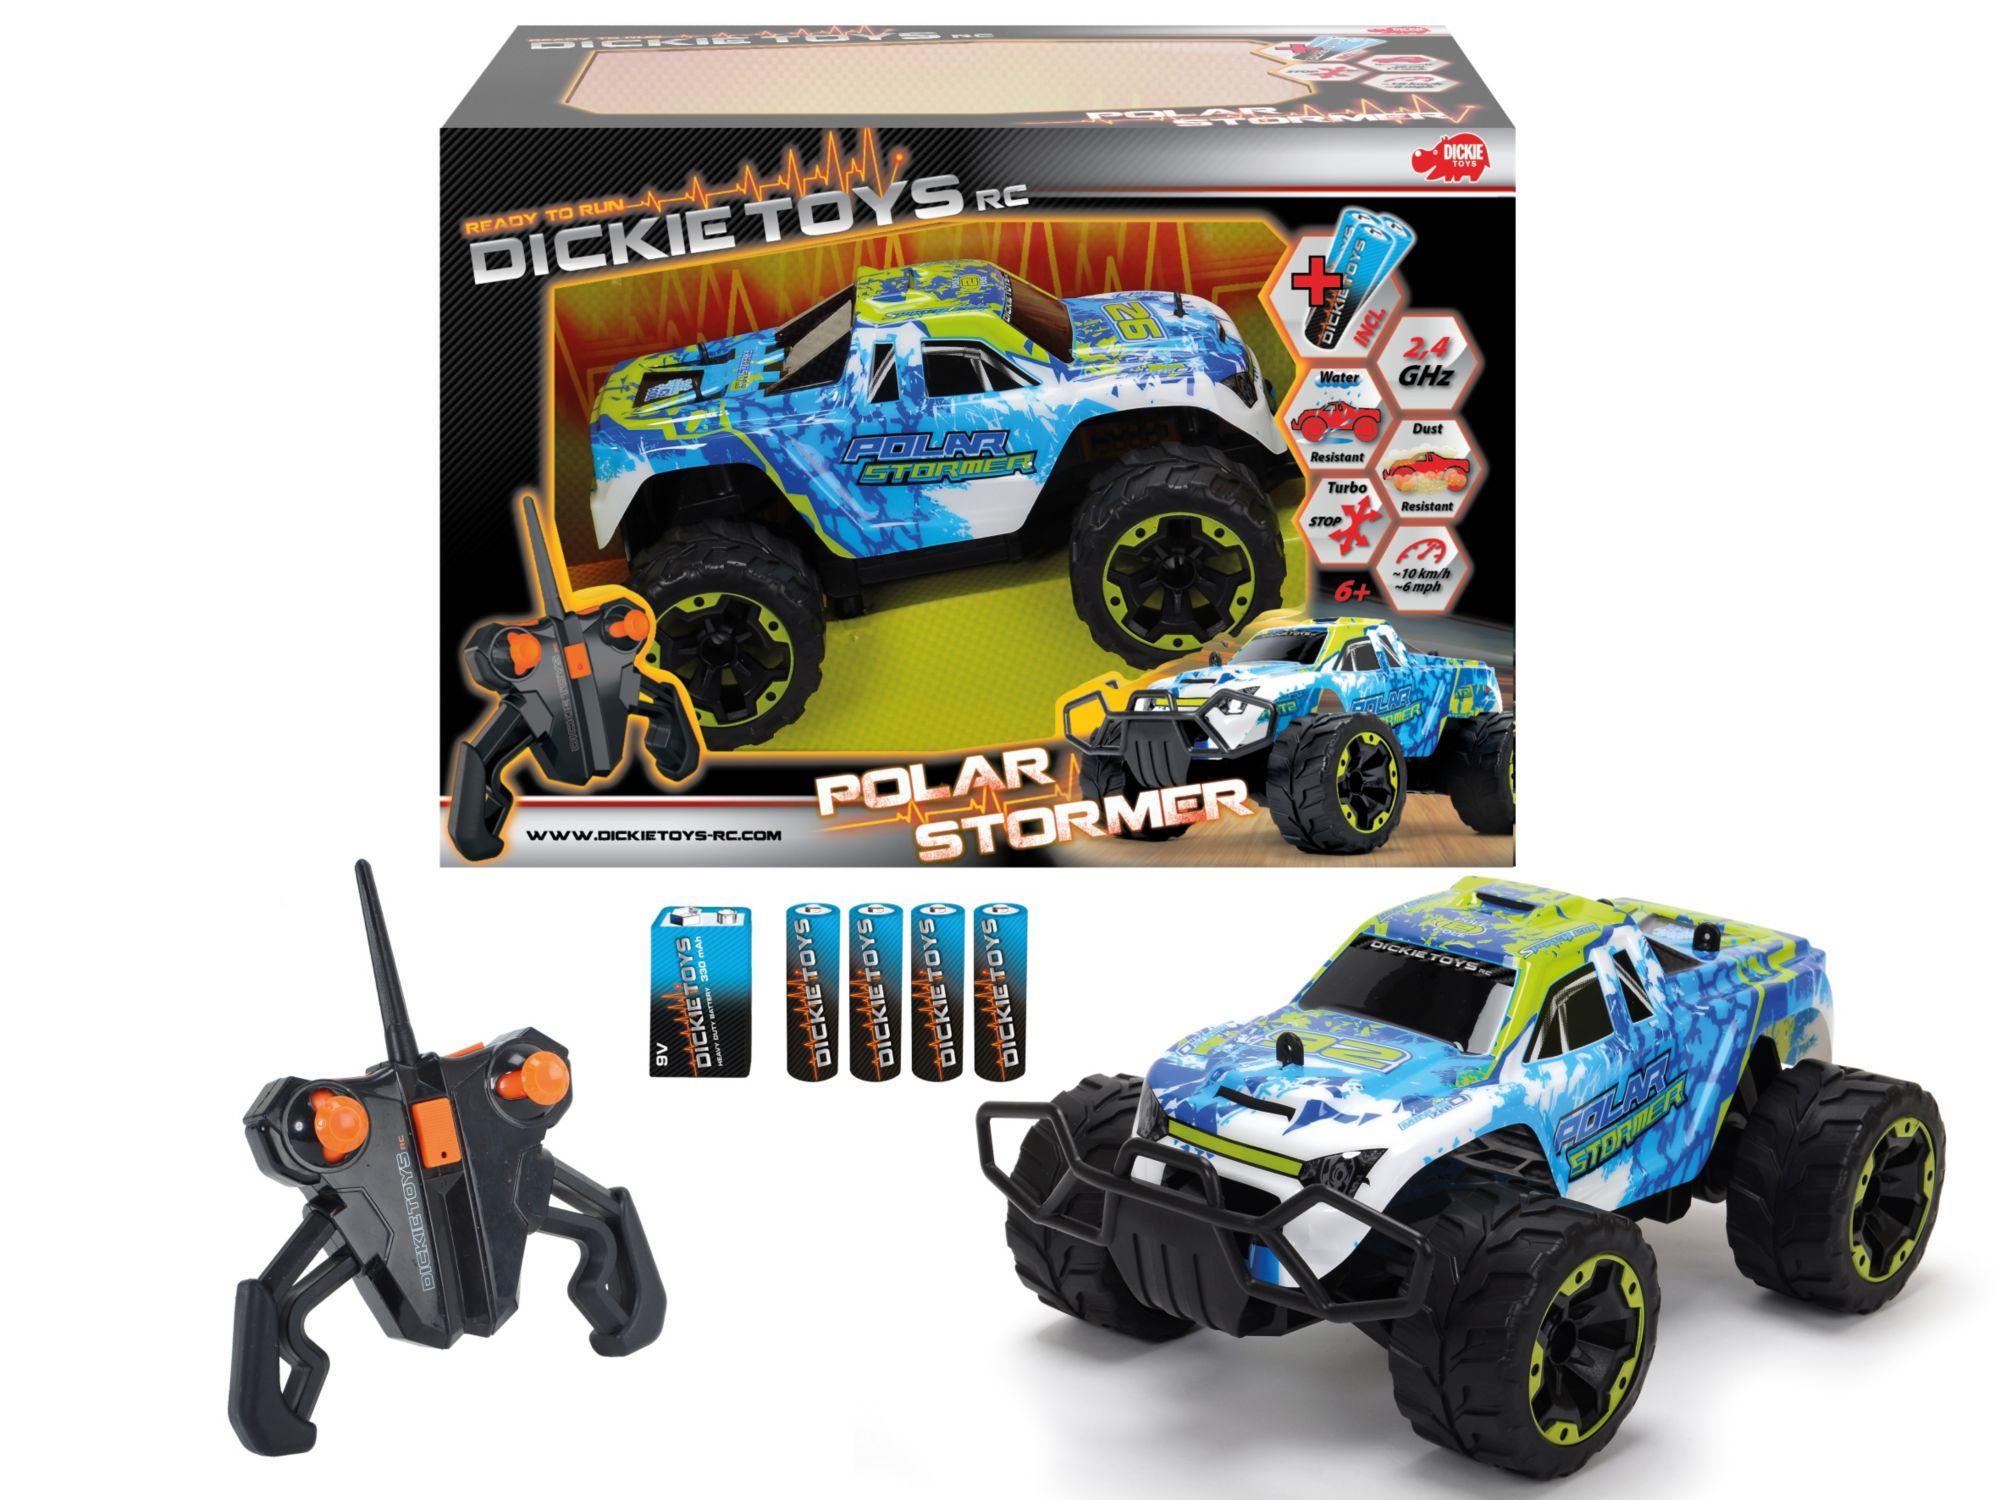 DICKIE TOYS Dickie Toys RC Komplett Set, »Polar Stormer 2,4 GHz 1:16«